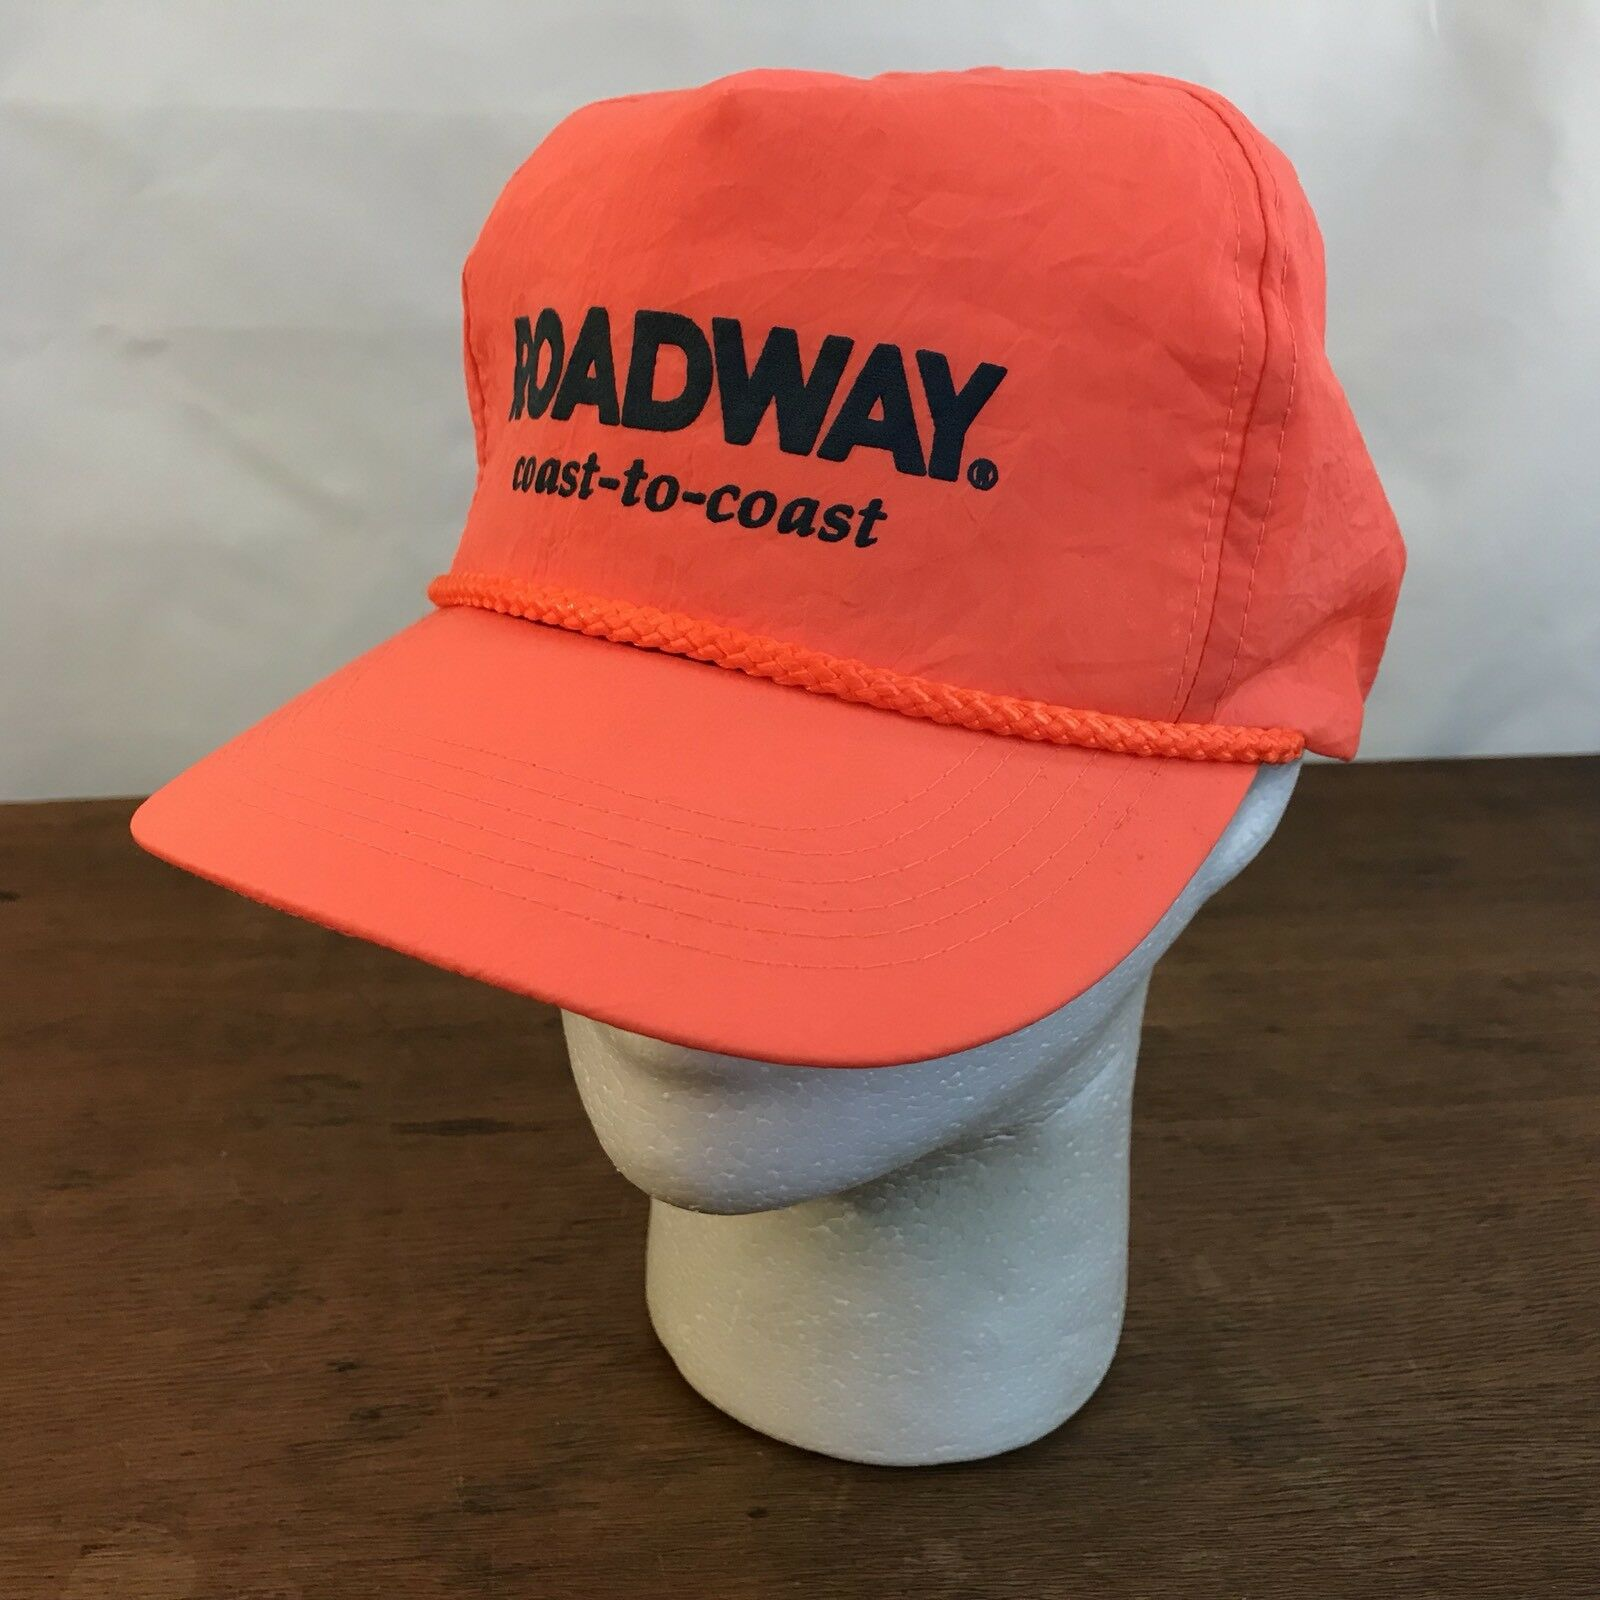 4dbc6b4807c18 Roadway Coast To Coast Hat Orange Nylon Snapback Trucker Cap Hat Coast CH24  e267ec